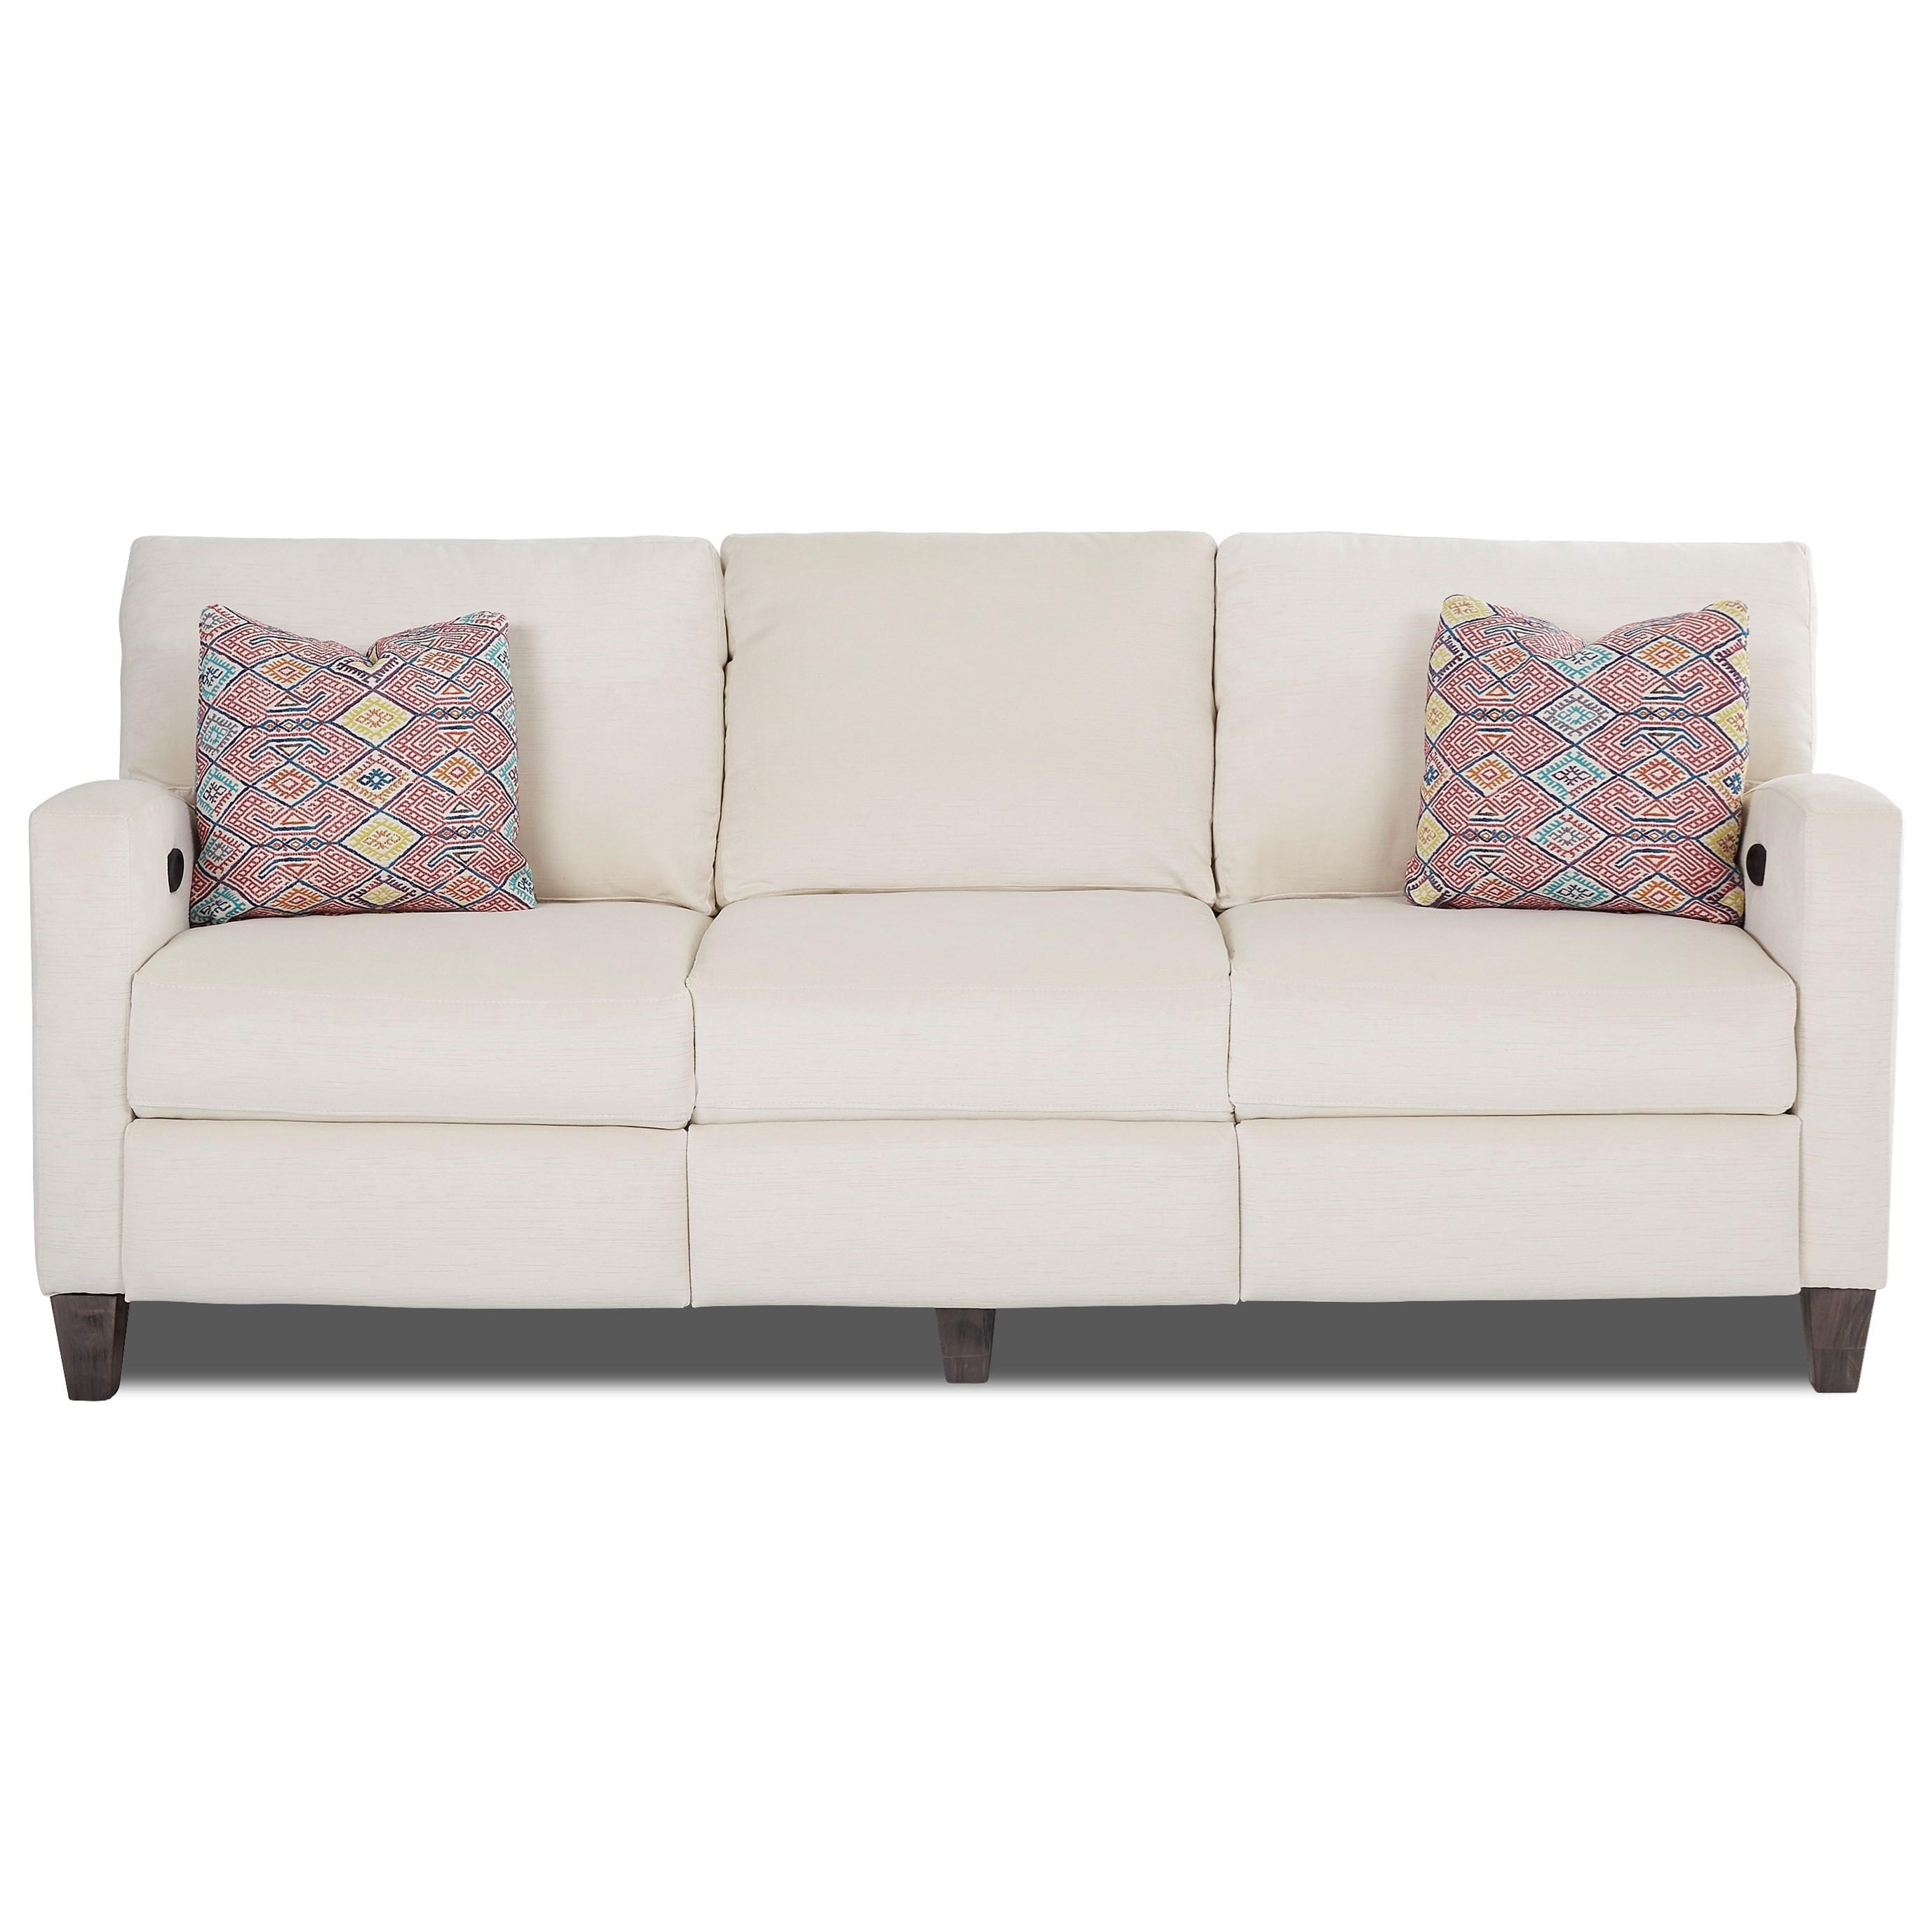 Power Hybrid Sofa with 2 Reclining Seats